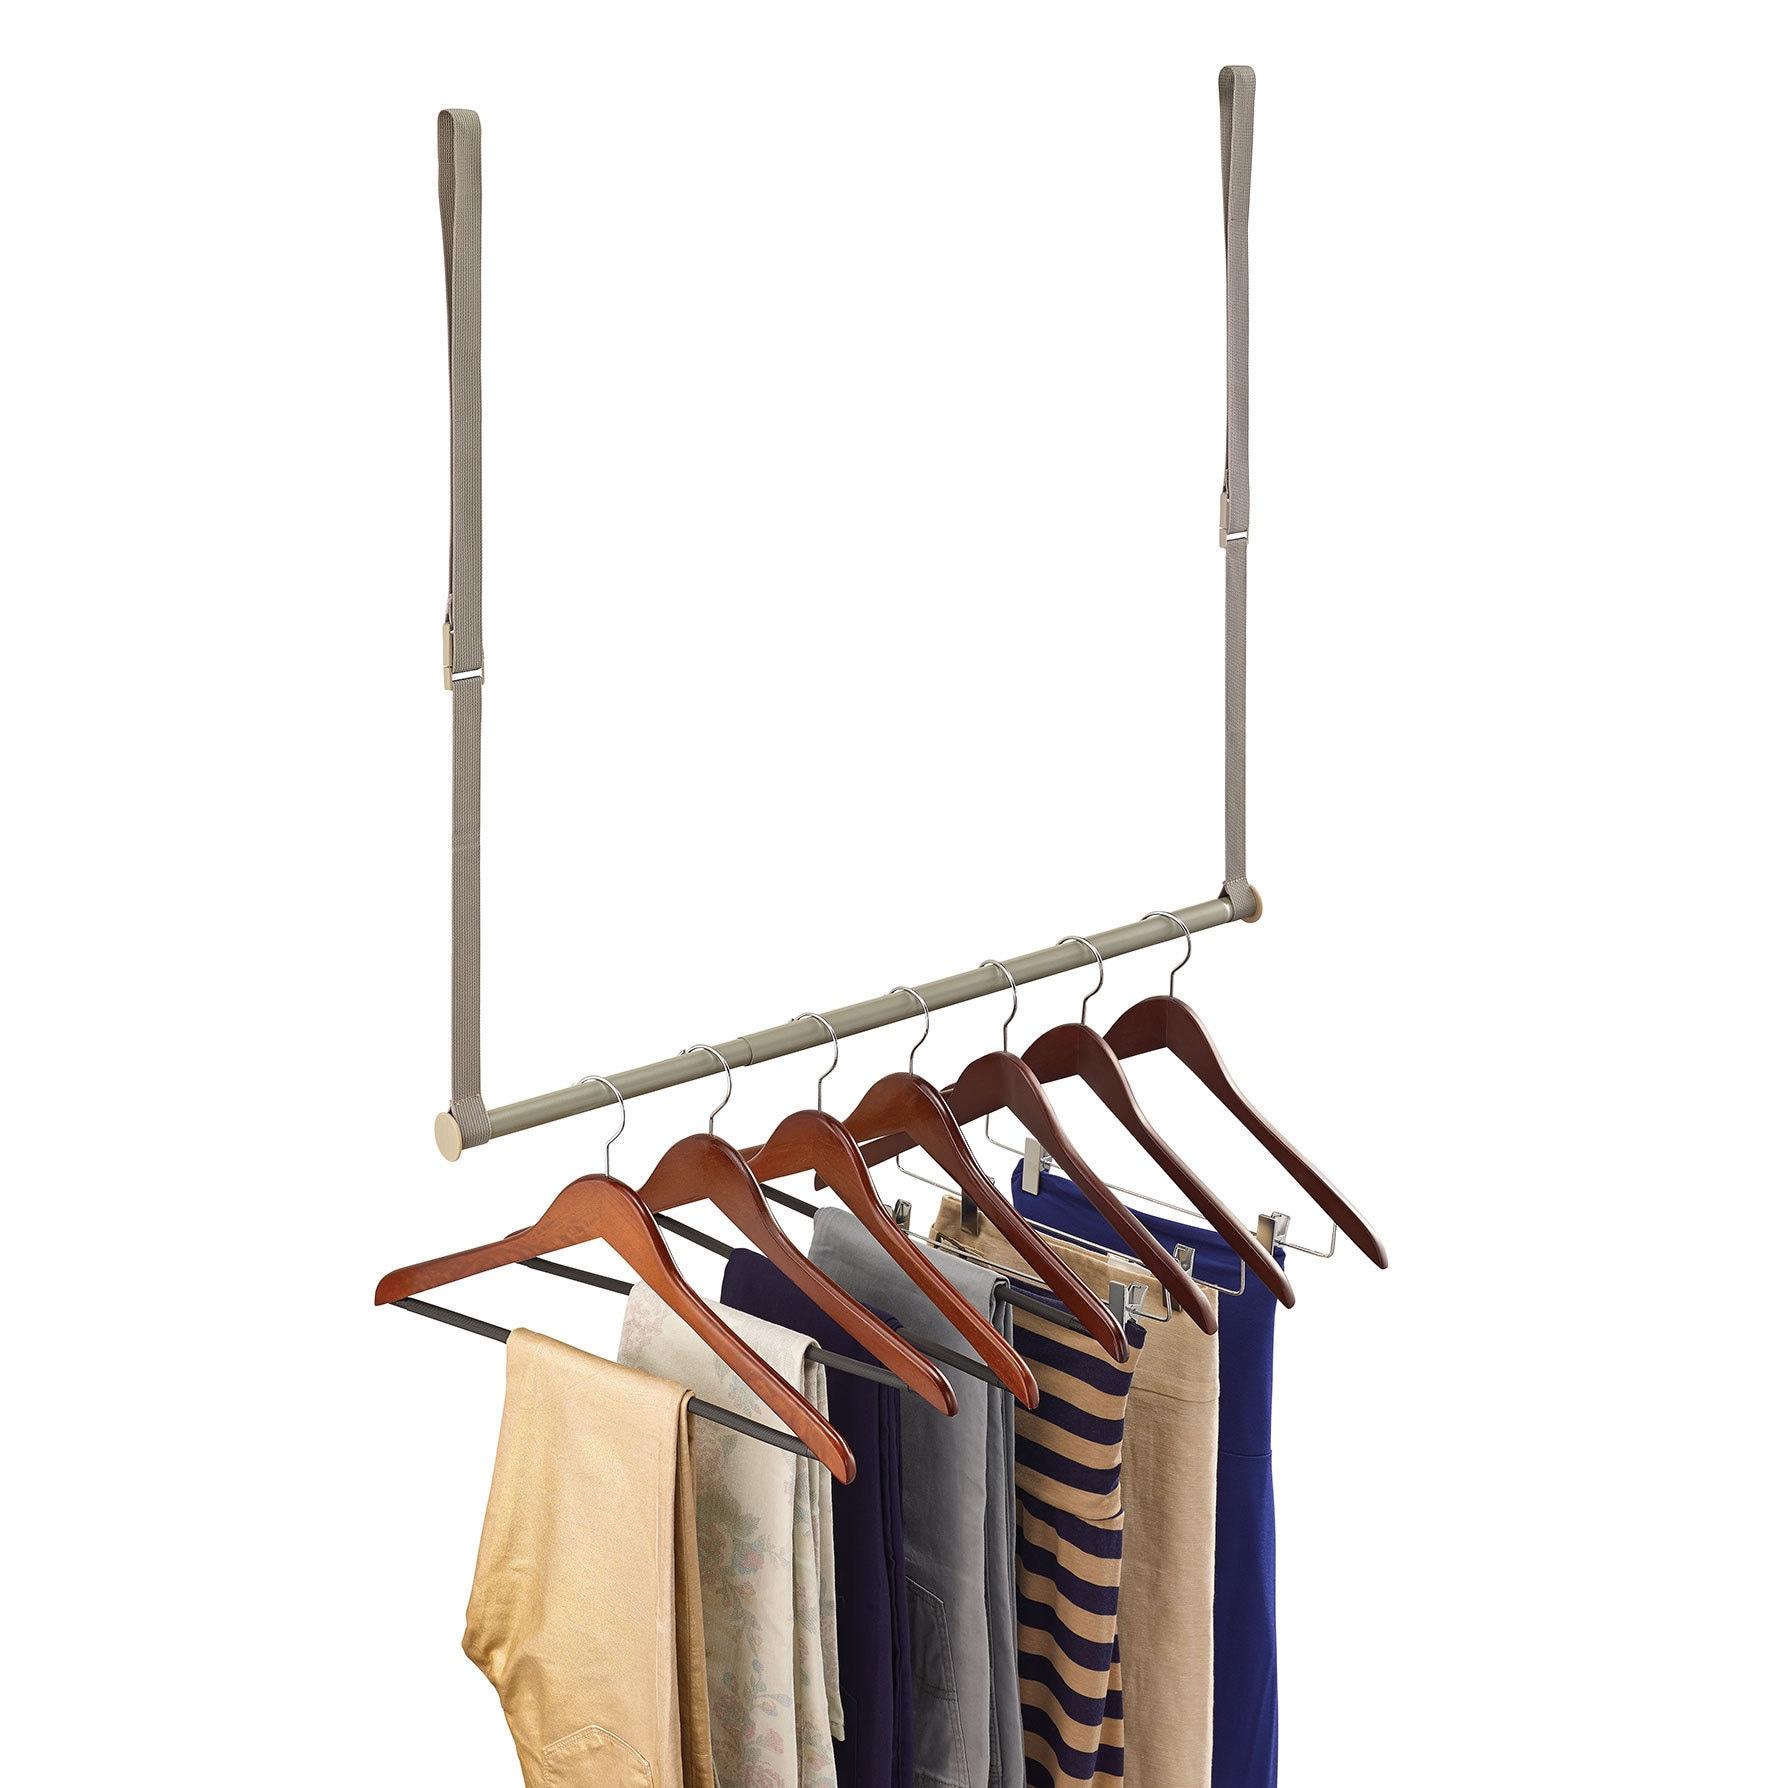 Closetmaid Nickel Double Hang Closet Rod (37in. tall, 37i...